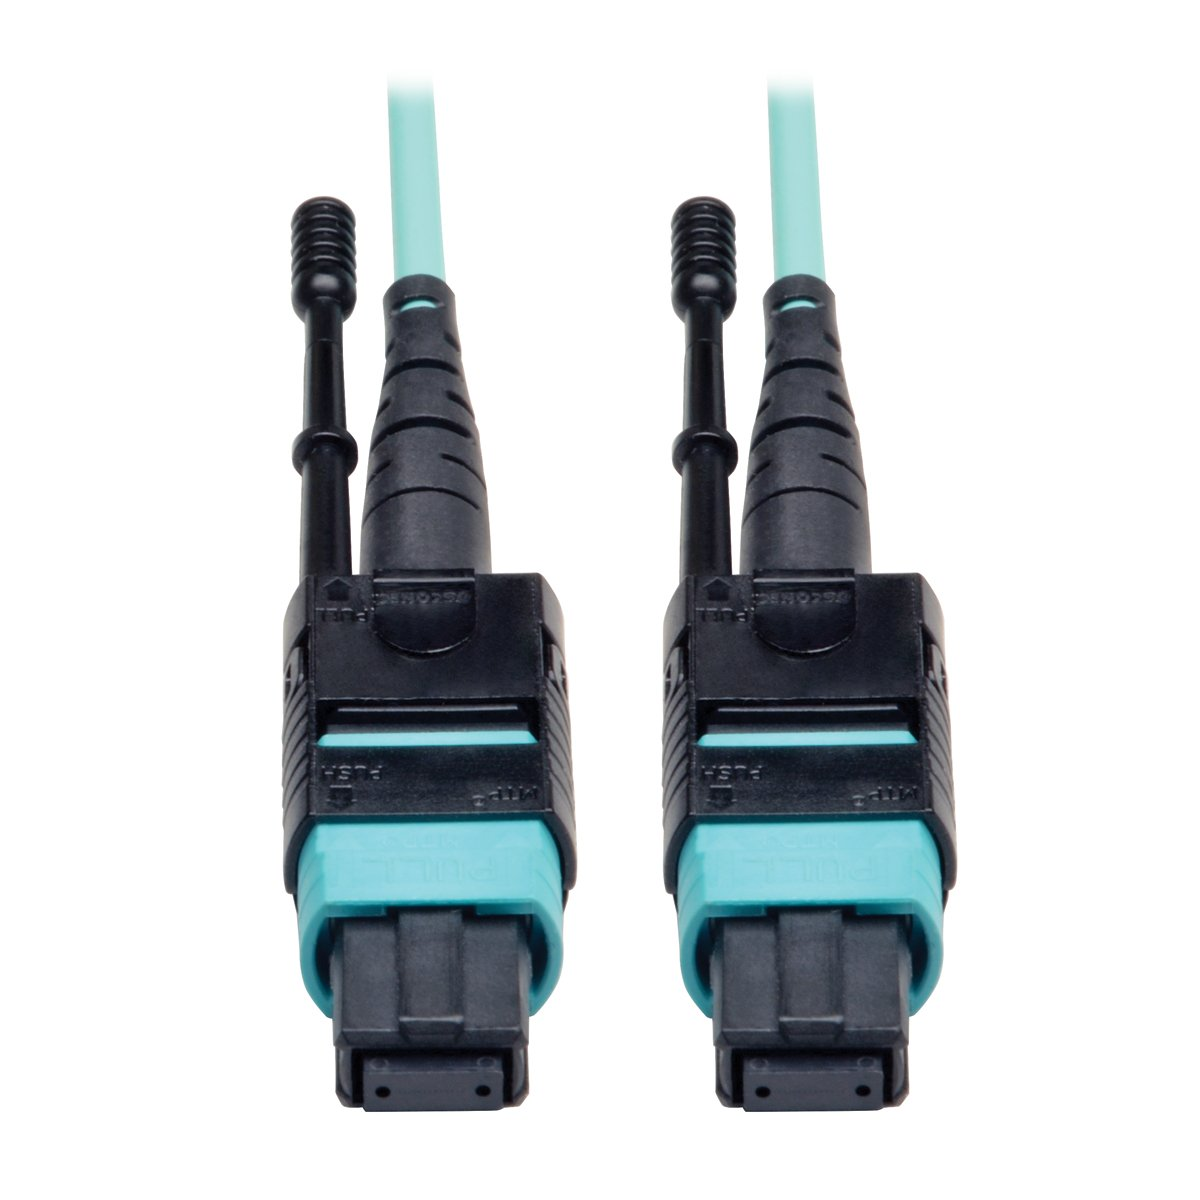 Tripp Lite MTP / MPO Patch Cable 12 Fiber,40GbE, 40GBASE-SR4,OM3 Plenum-rated - Aqua, 10M (33-ft.)(N844-10M-12-P)